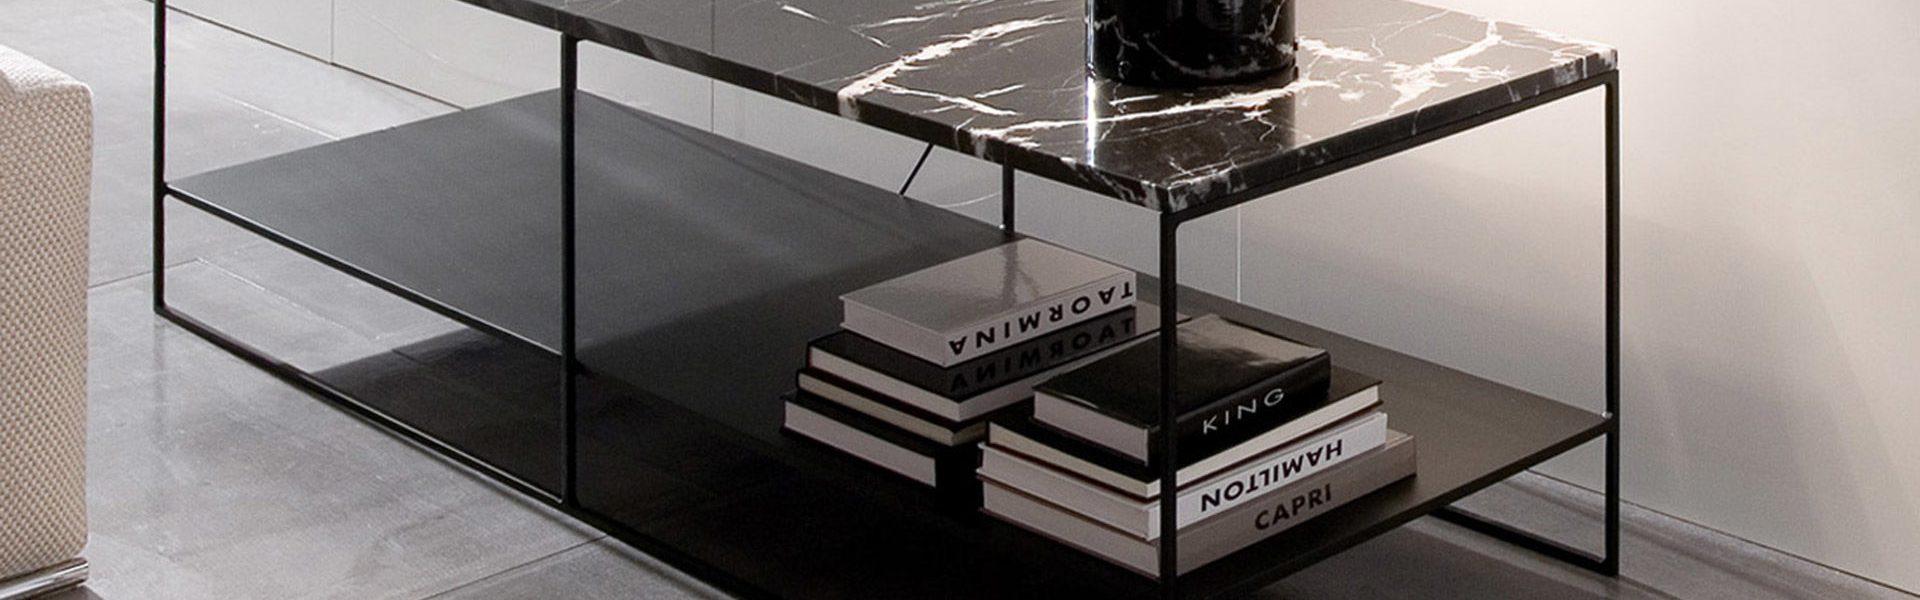 Calder Console